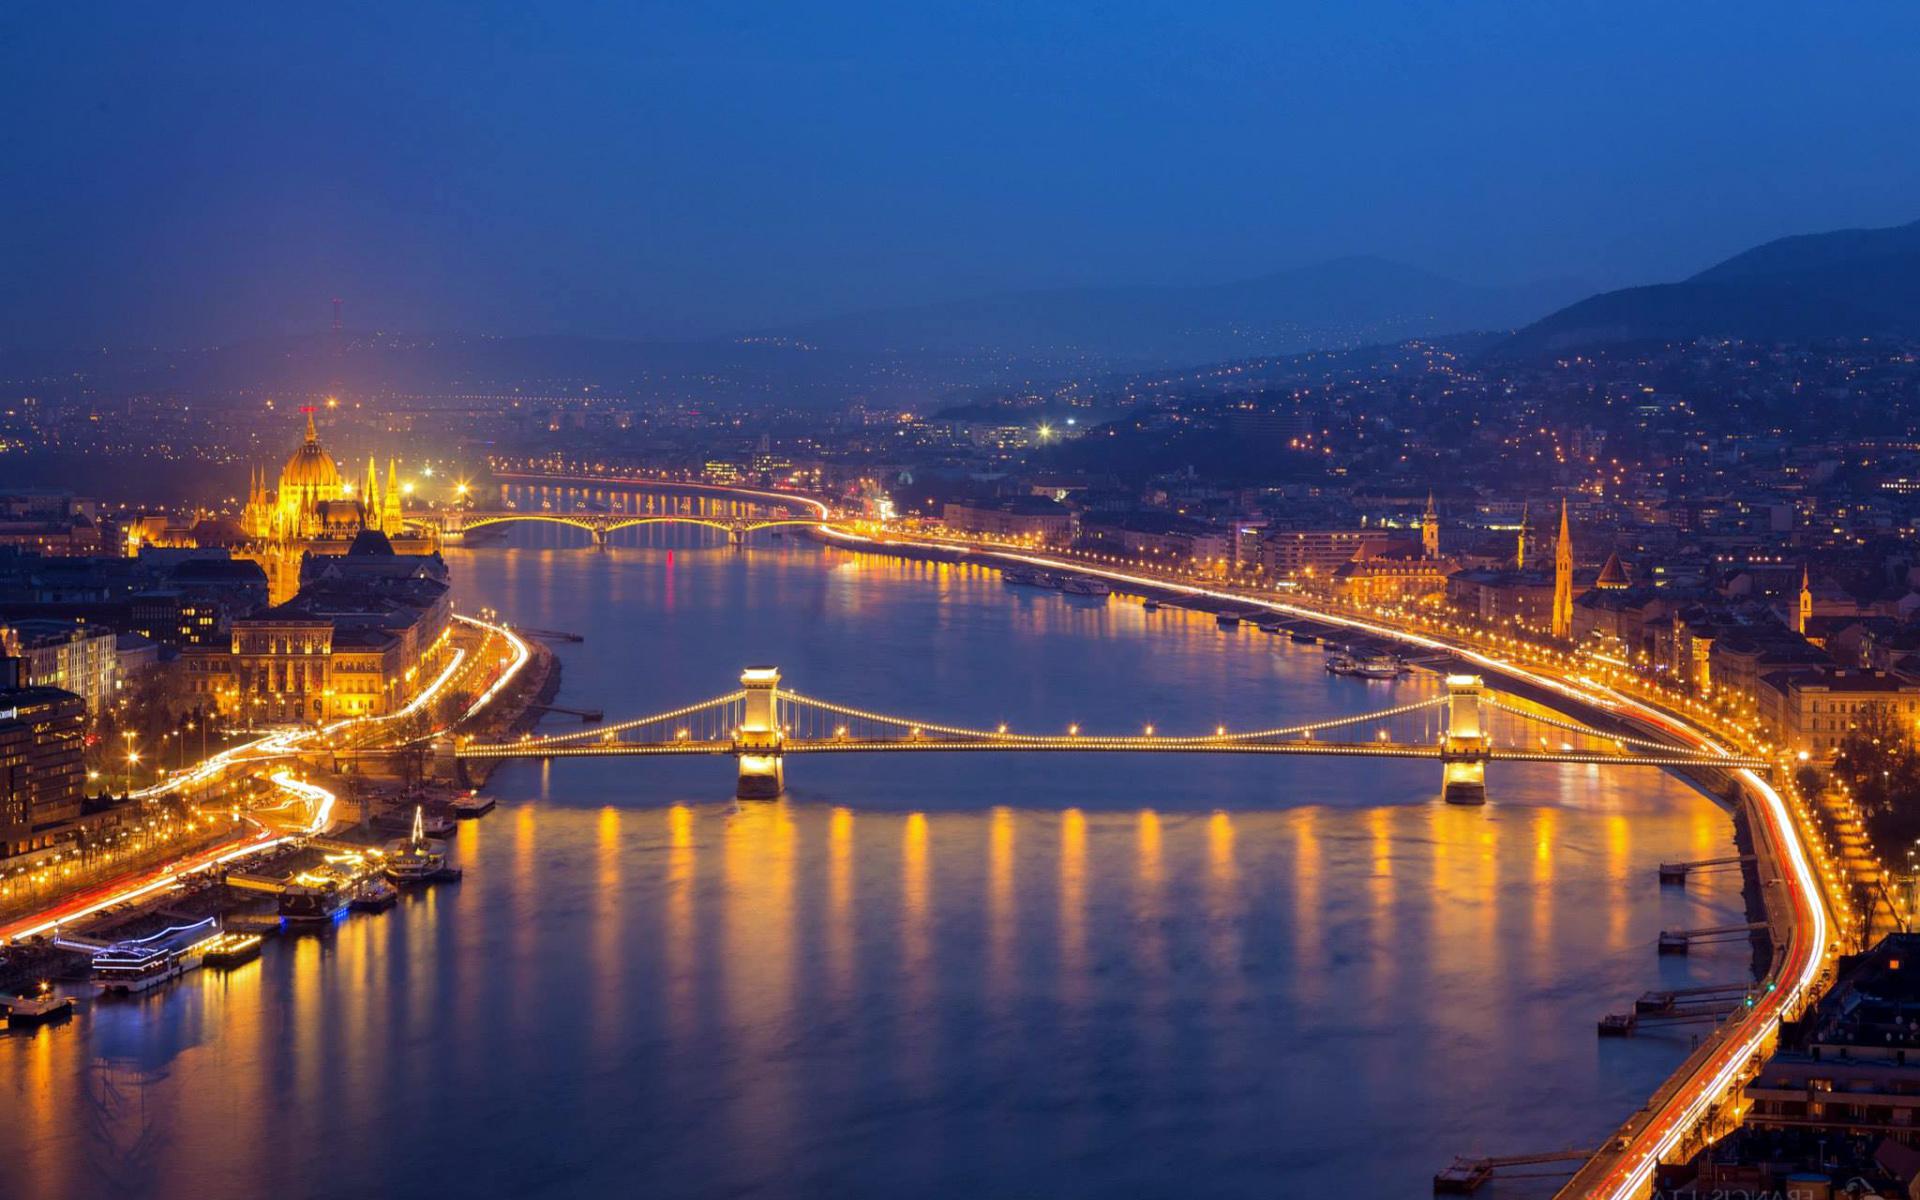 HDoboi.Kiev.ua - Будапешт - Венгрия, ночной город